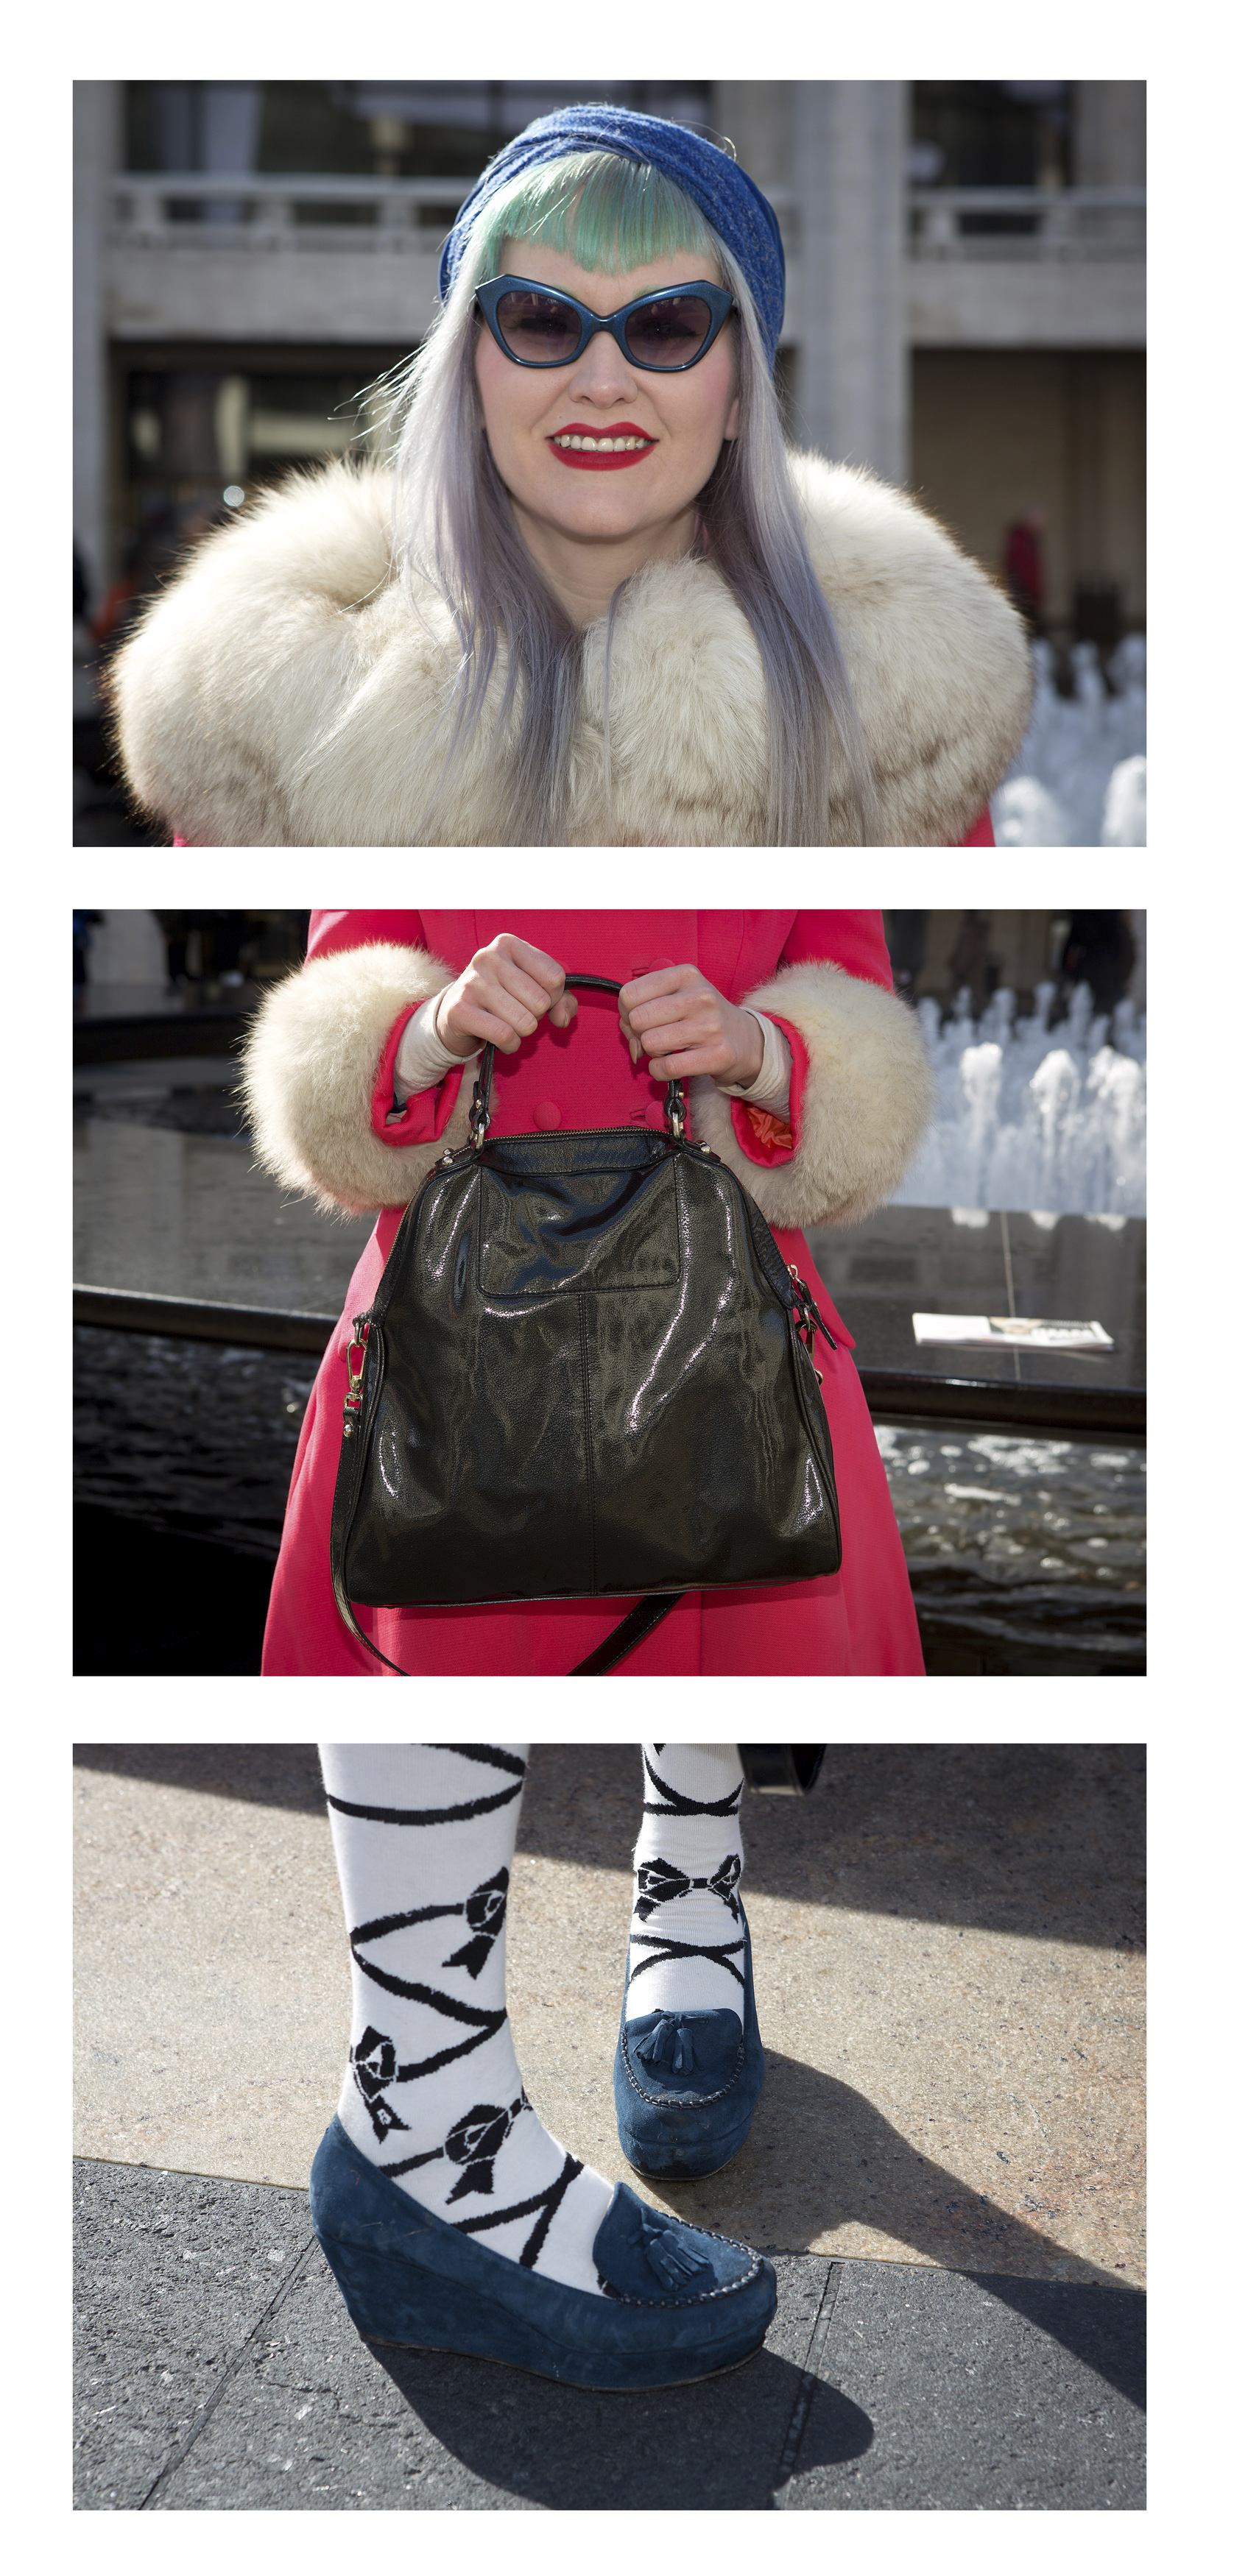 Gallery:  Triptych portraits during New York Fashion Week 2014